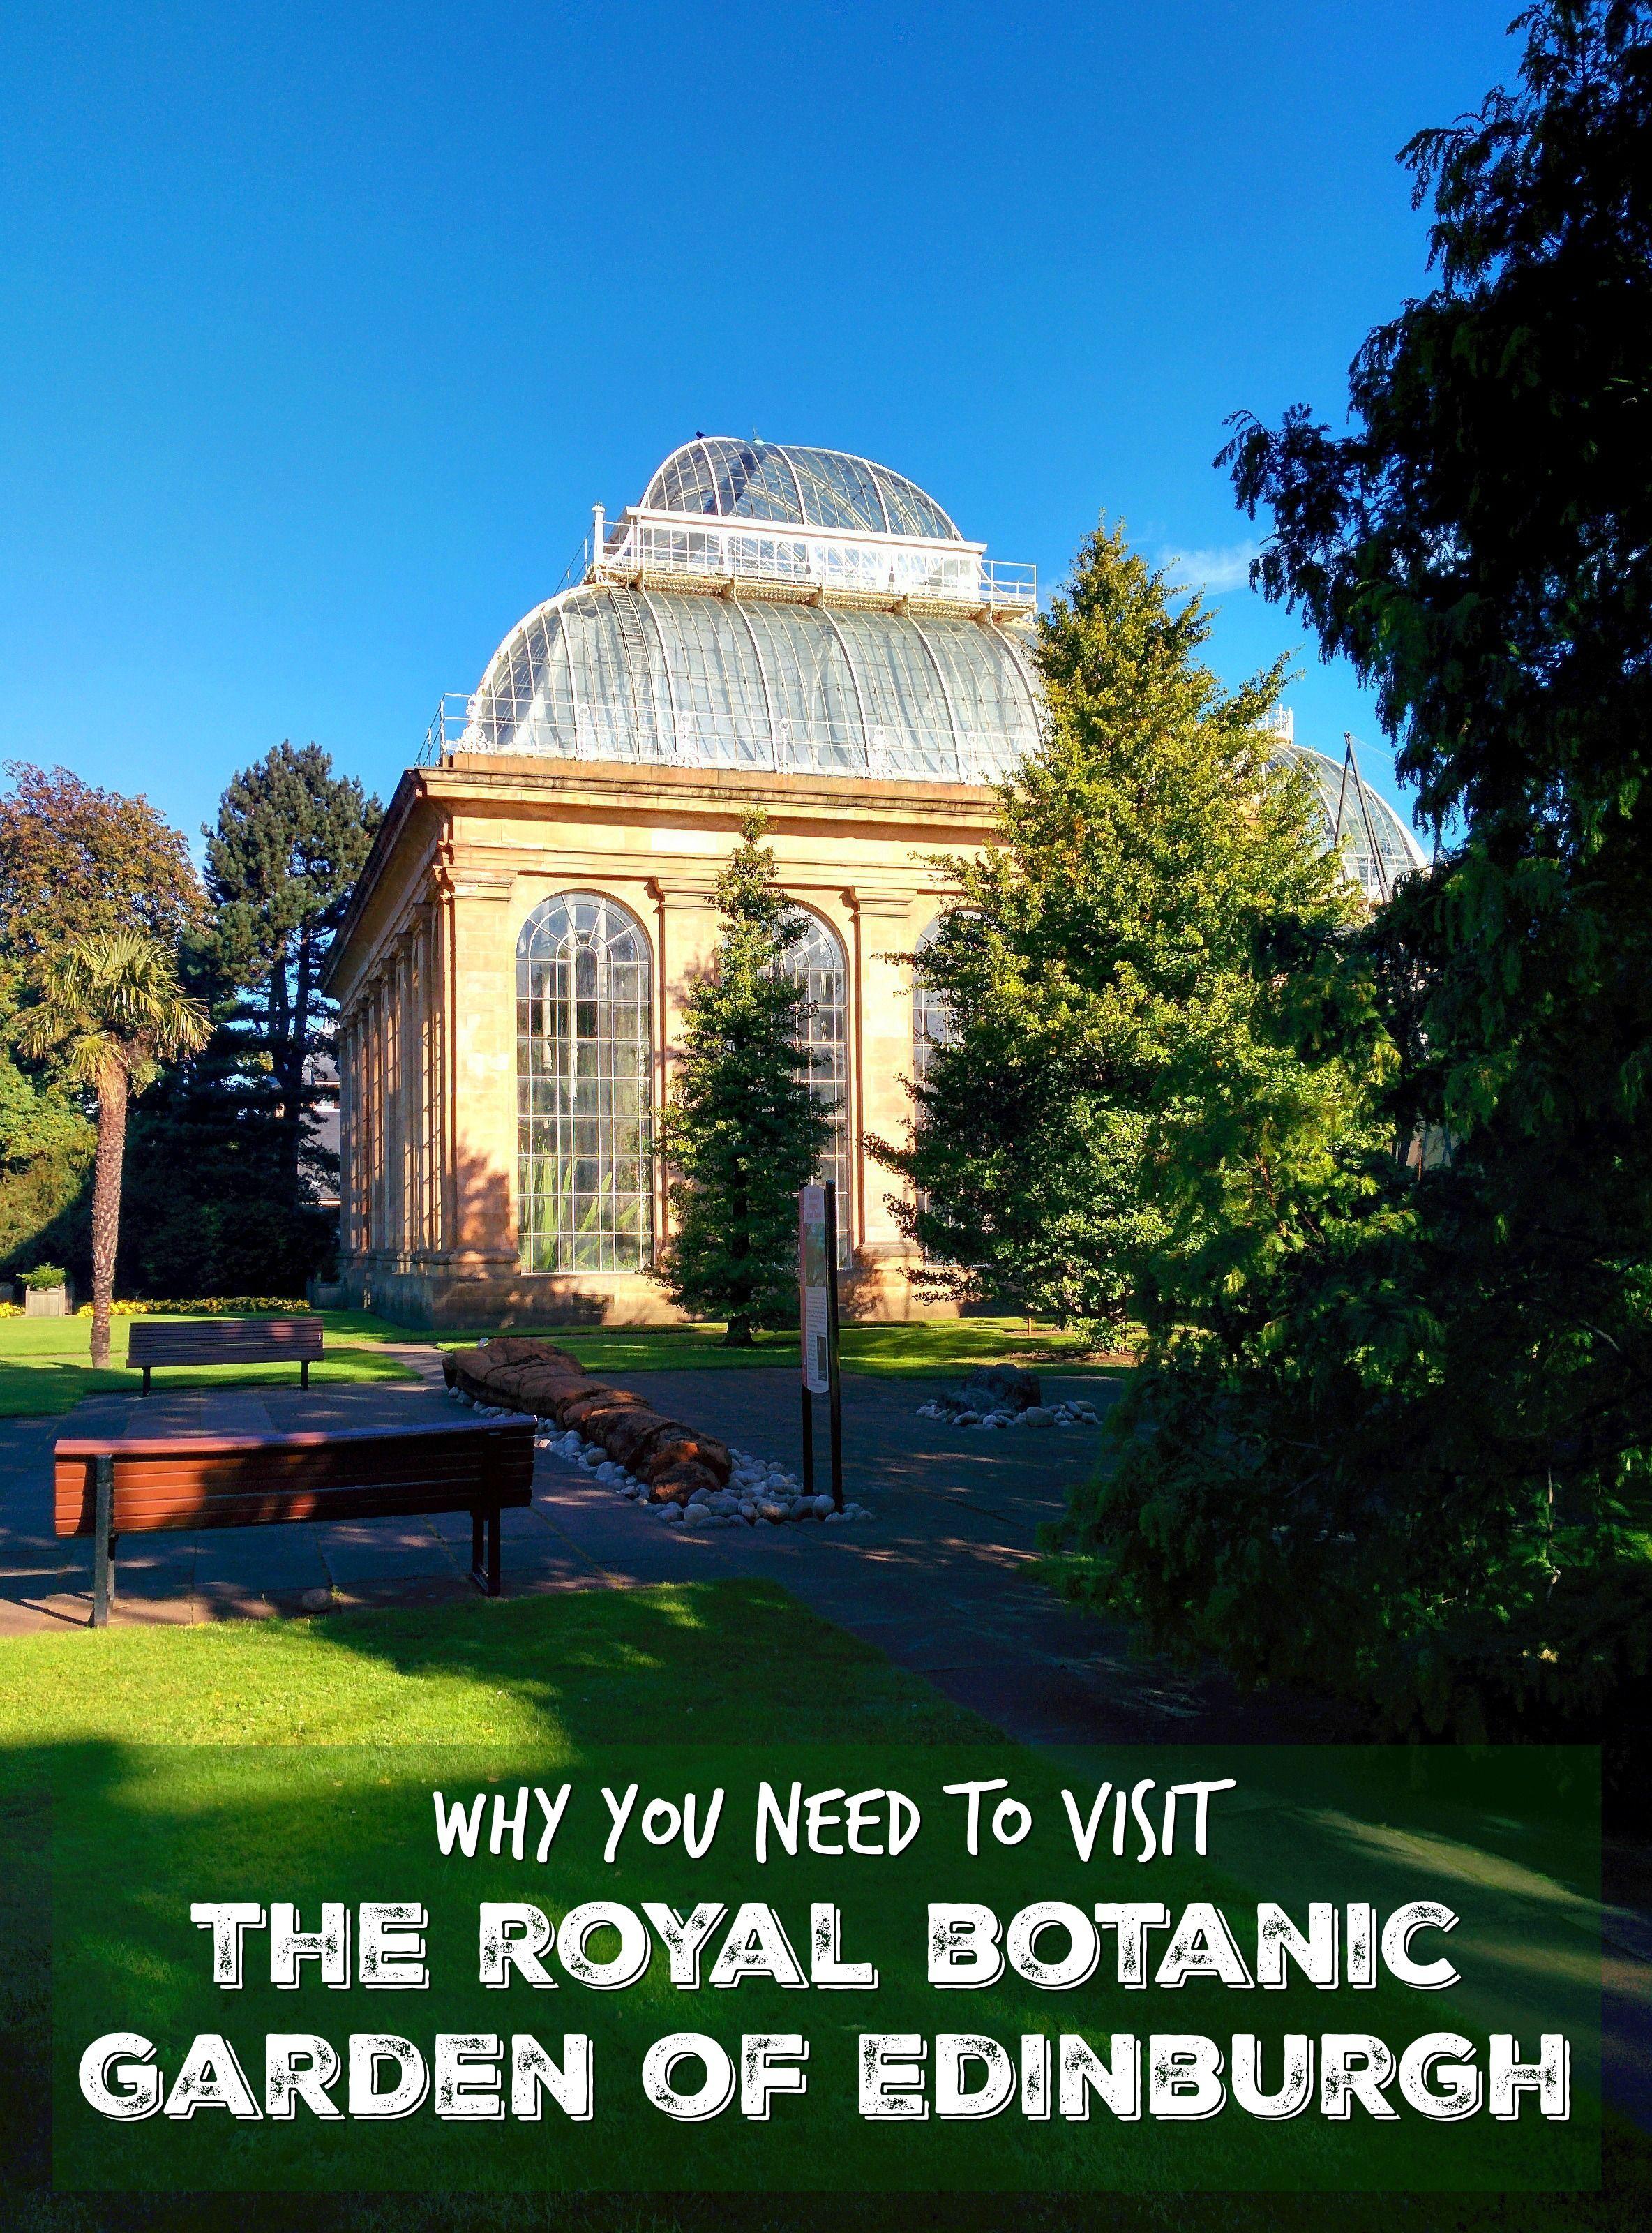 The Royal Botanic Gardens of Edinburgh #botanicgarden